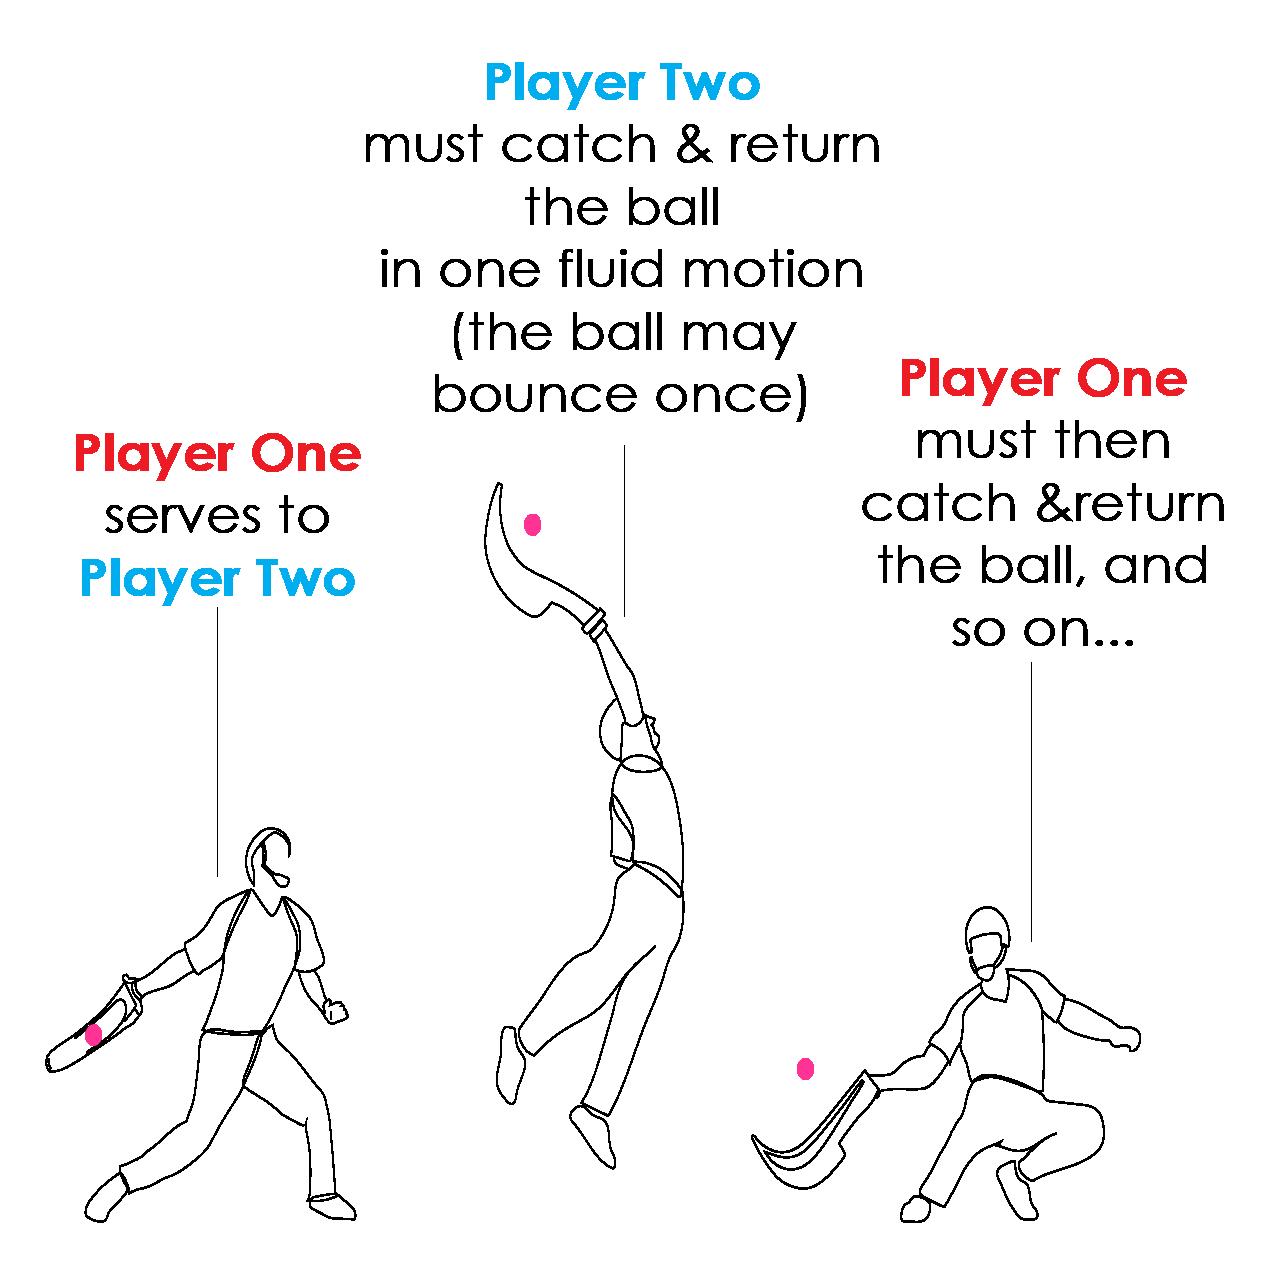 UnderstandingJai-Alai_diagram_The Jai_website-04.png